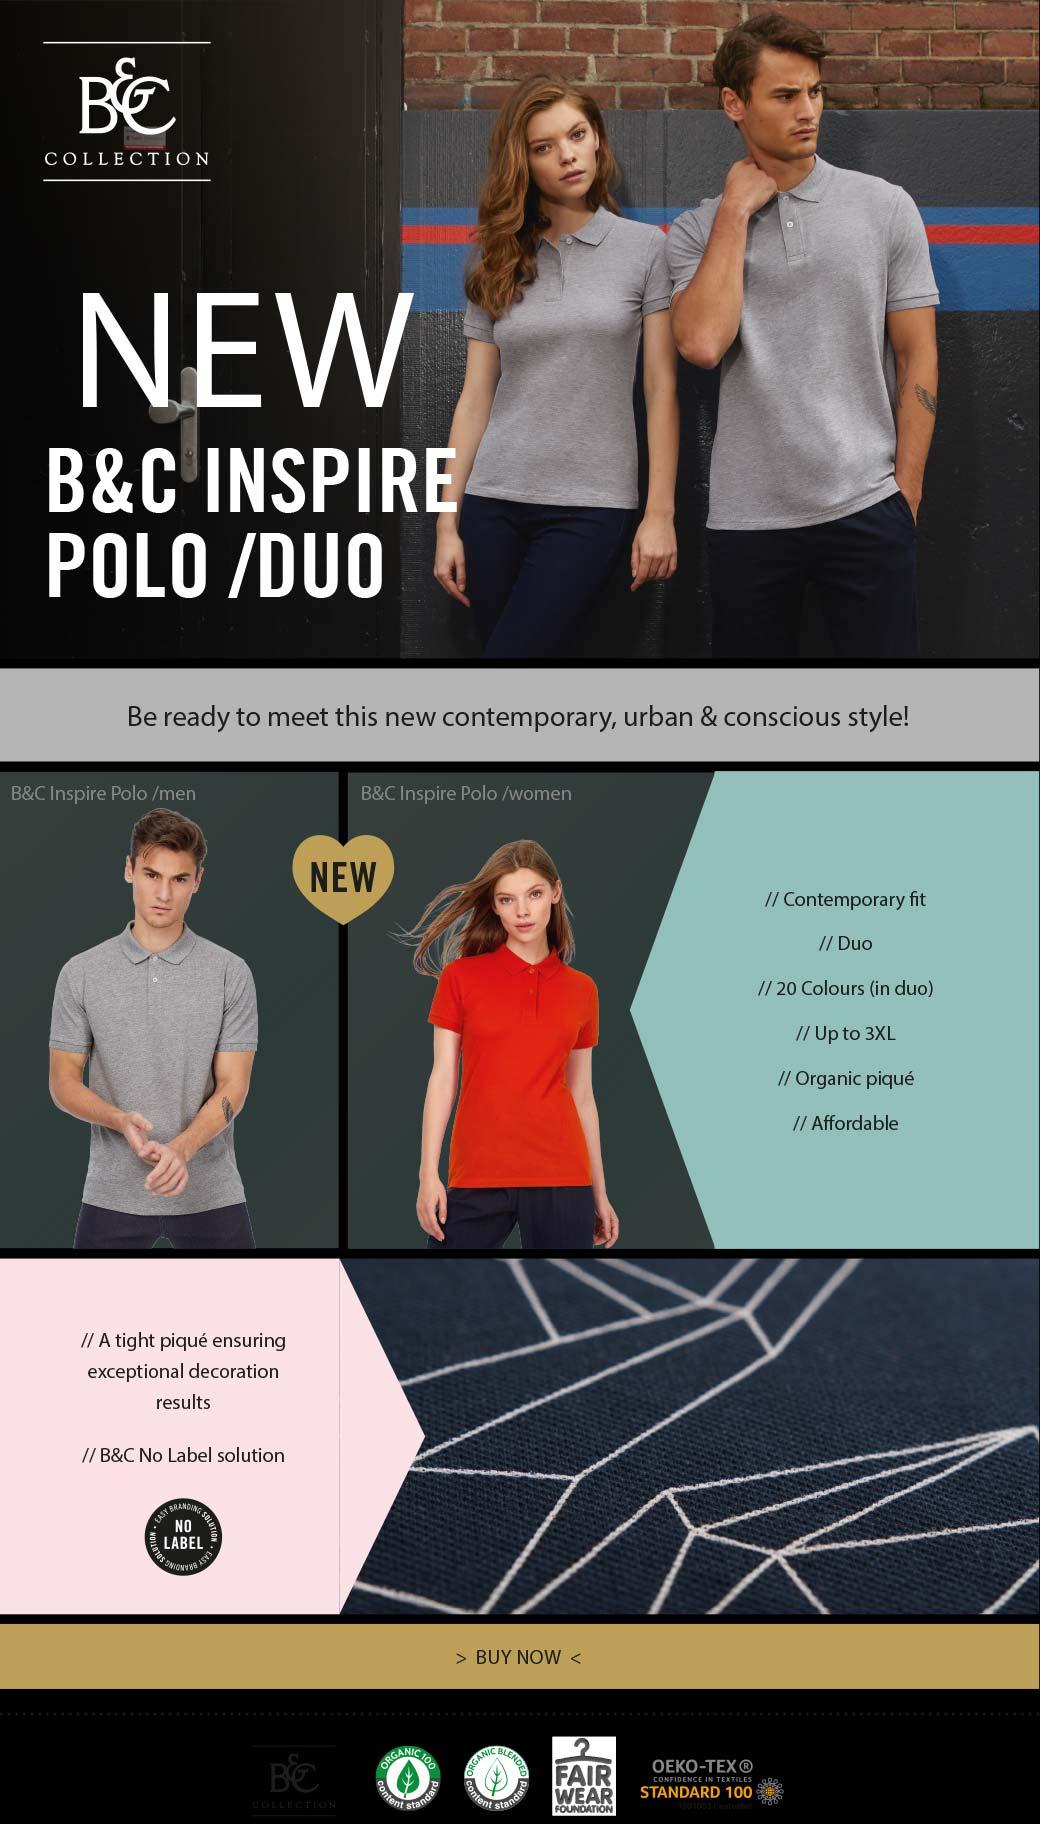 B&C Inspire